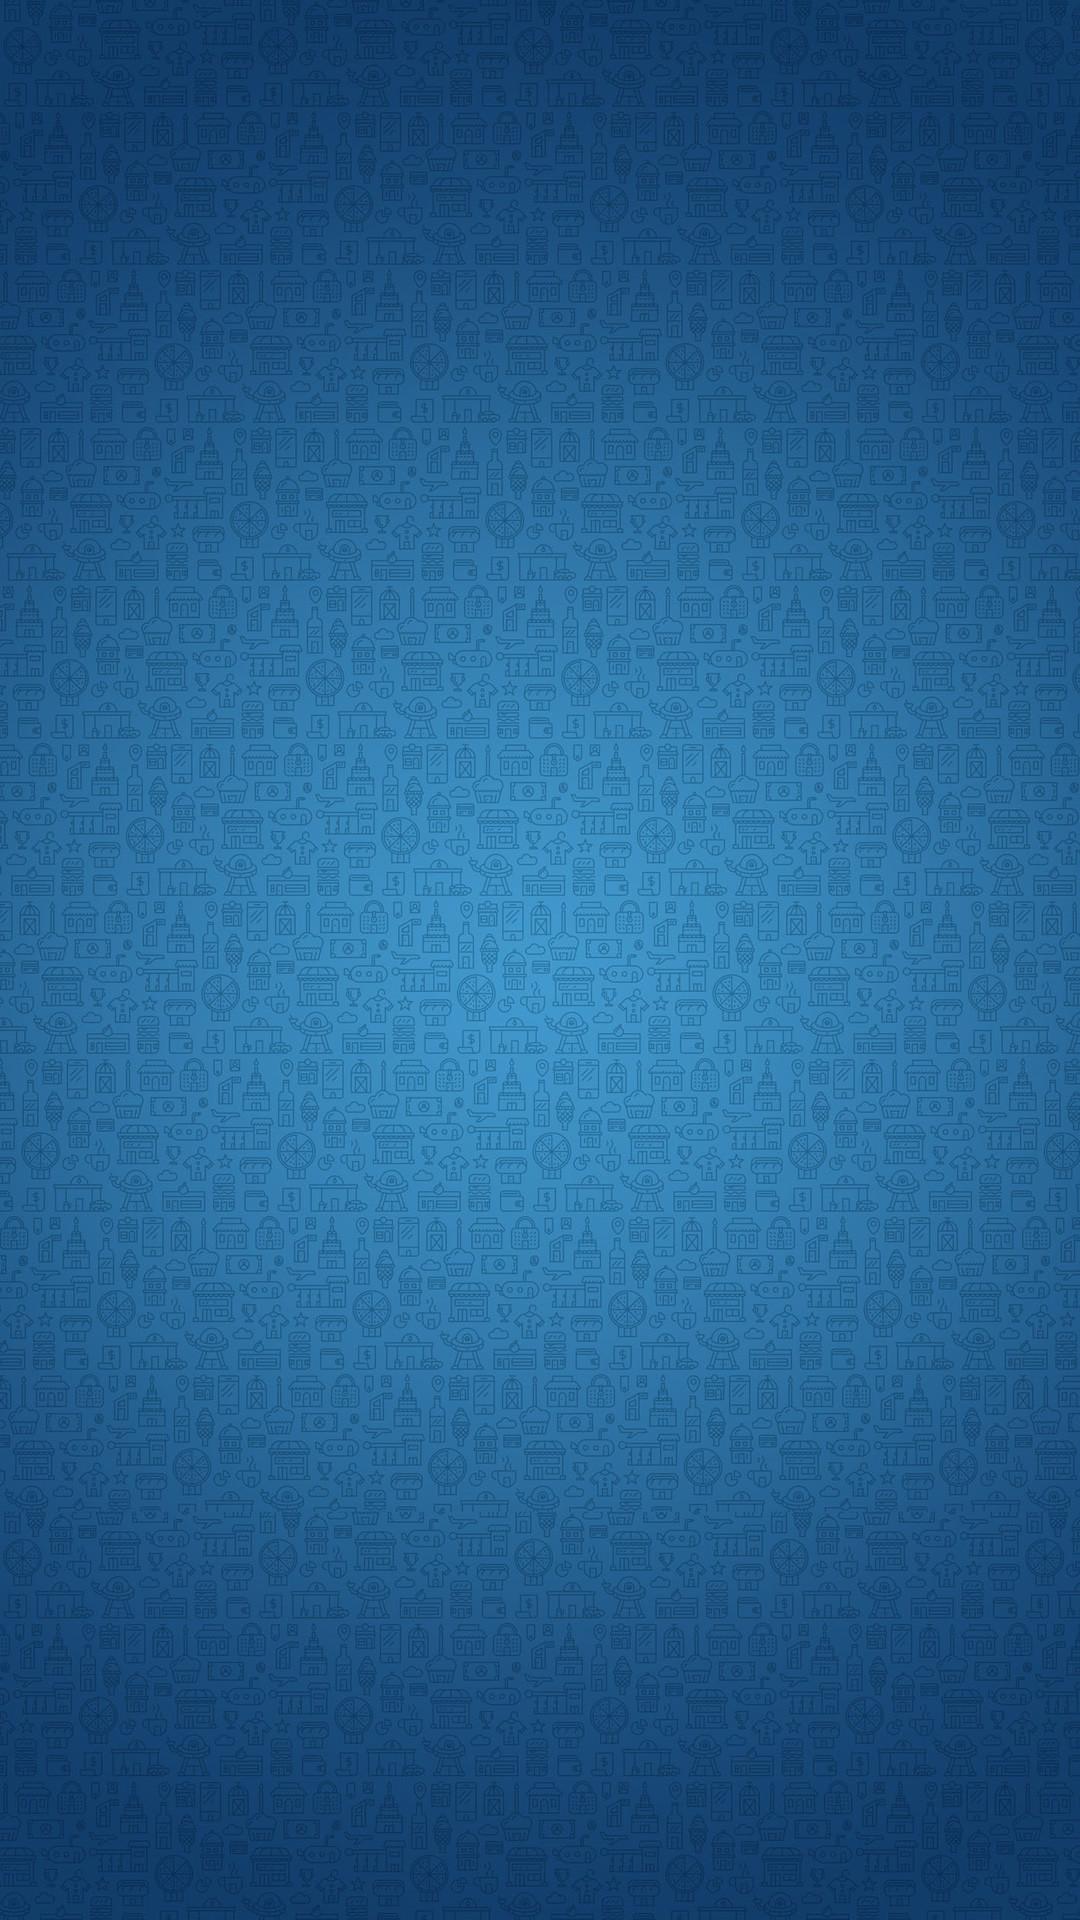 Blue Cartoon Background iPhone 6 wallpaper